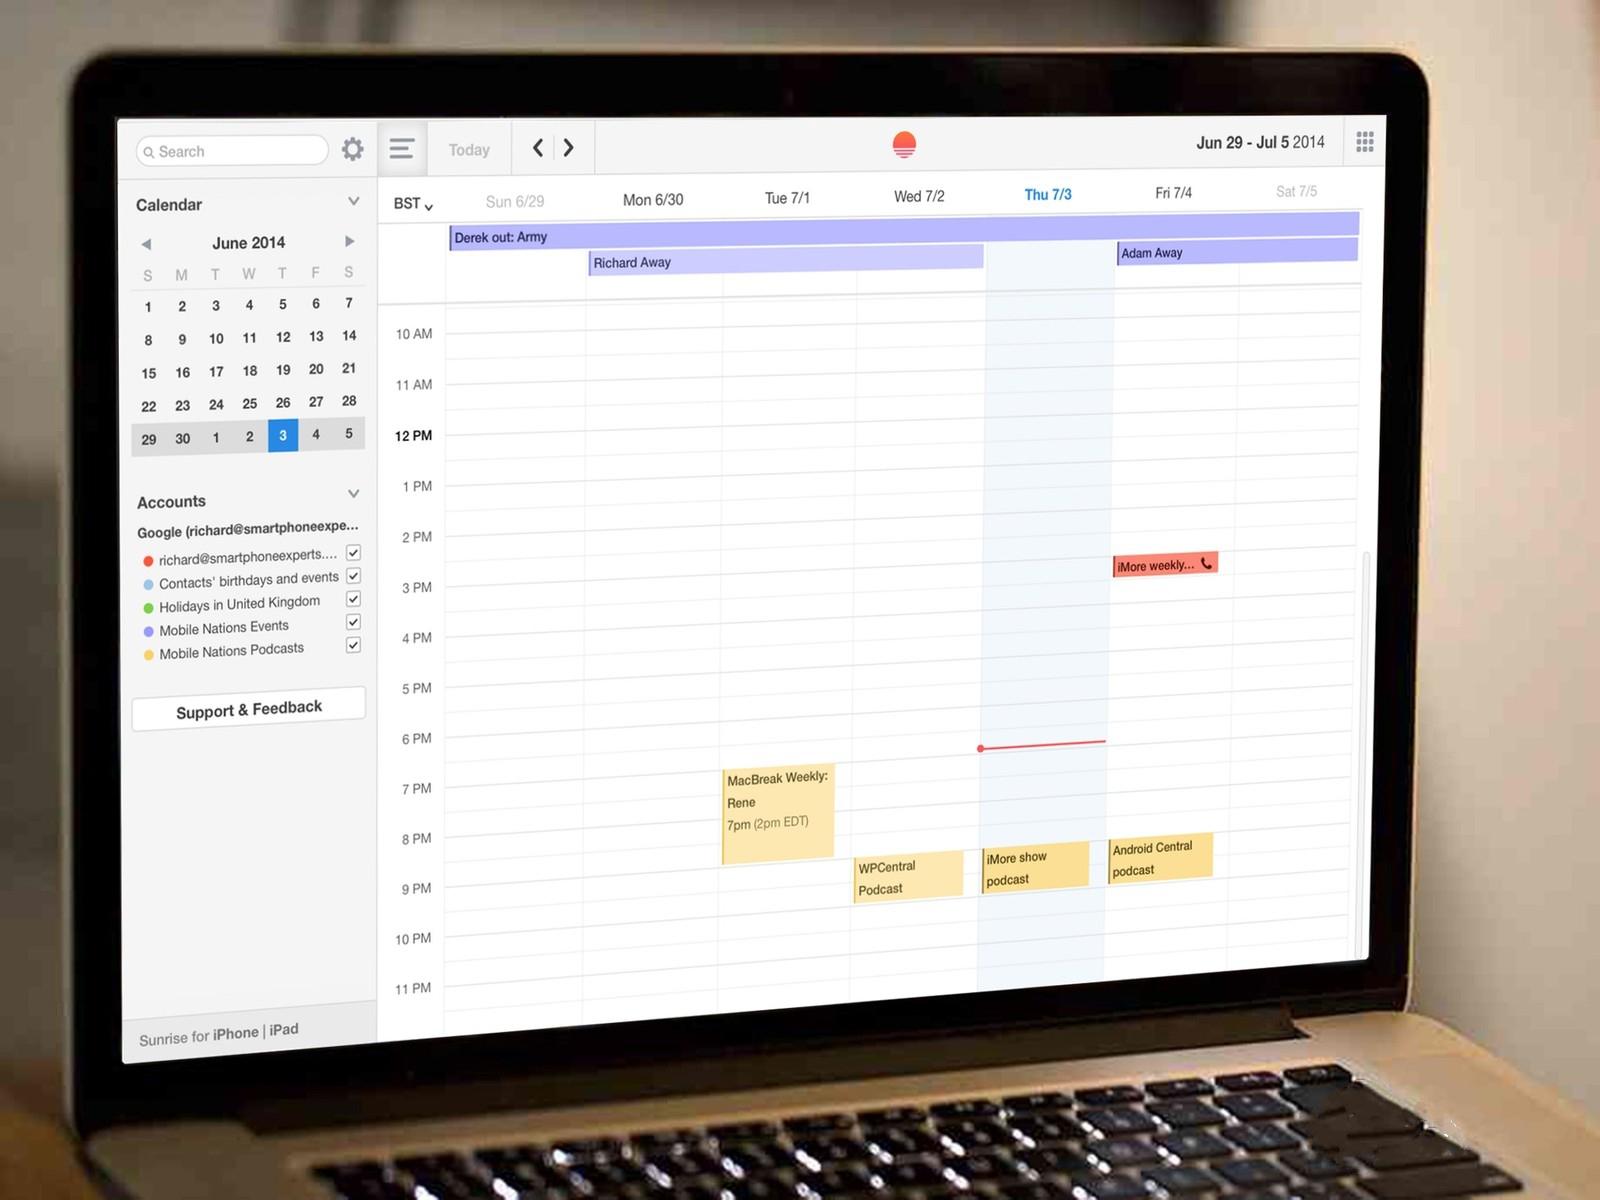 Sunrise Calendar пришел на OS X, получив поддержку Facebook, Evernote и других сервисов